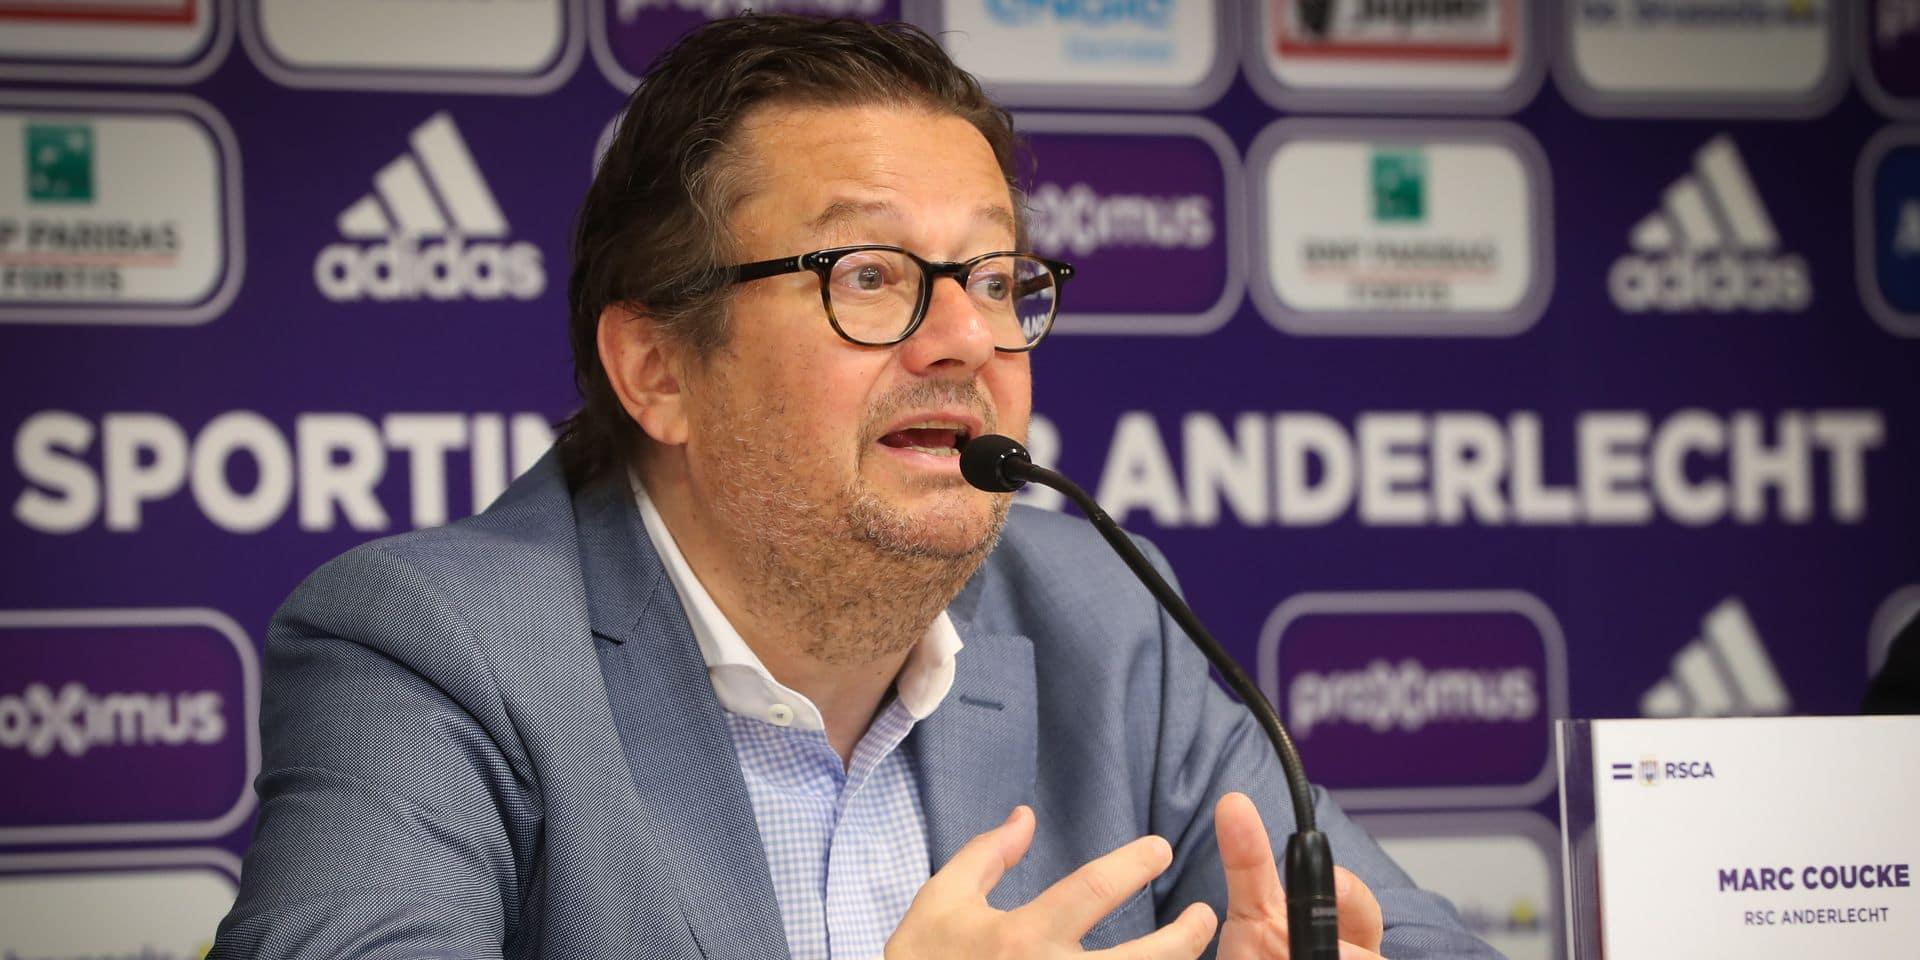 Marc Coucke annonce 4 transferts: Milic, Musona, Adzic et Saief